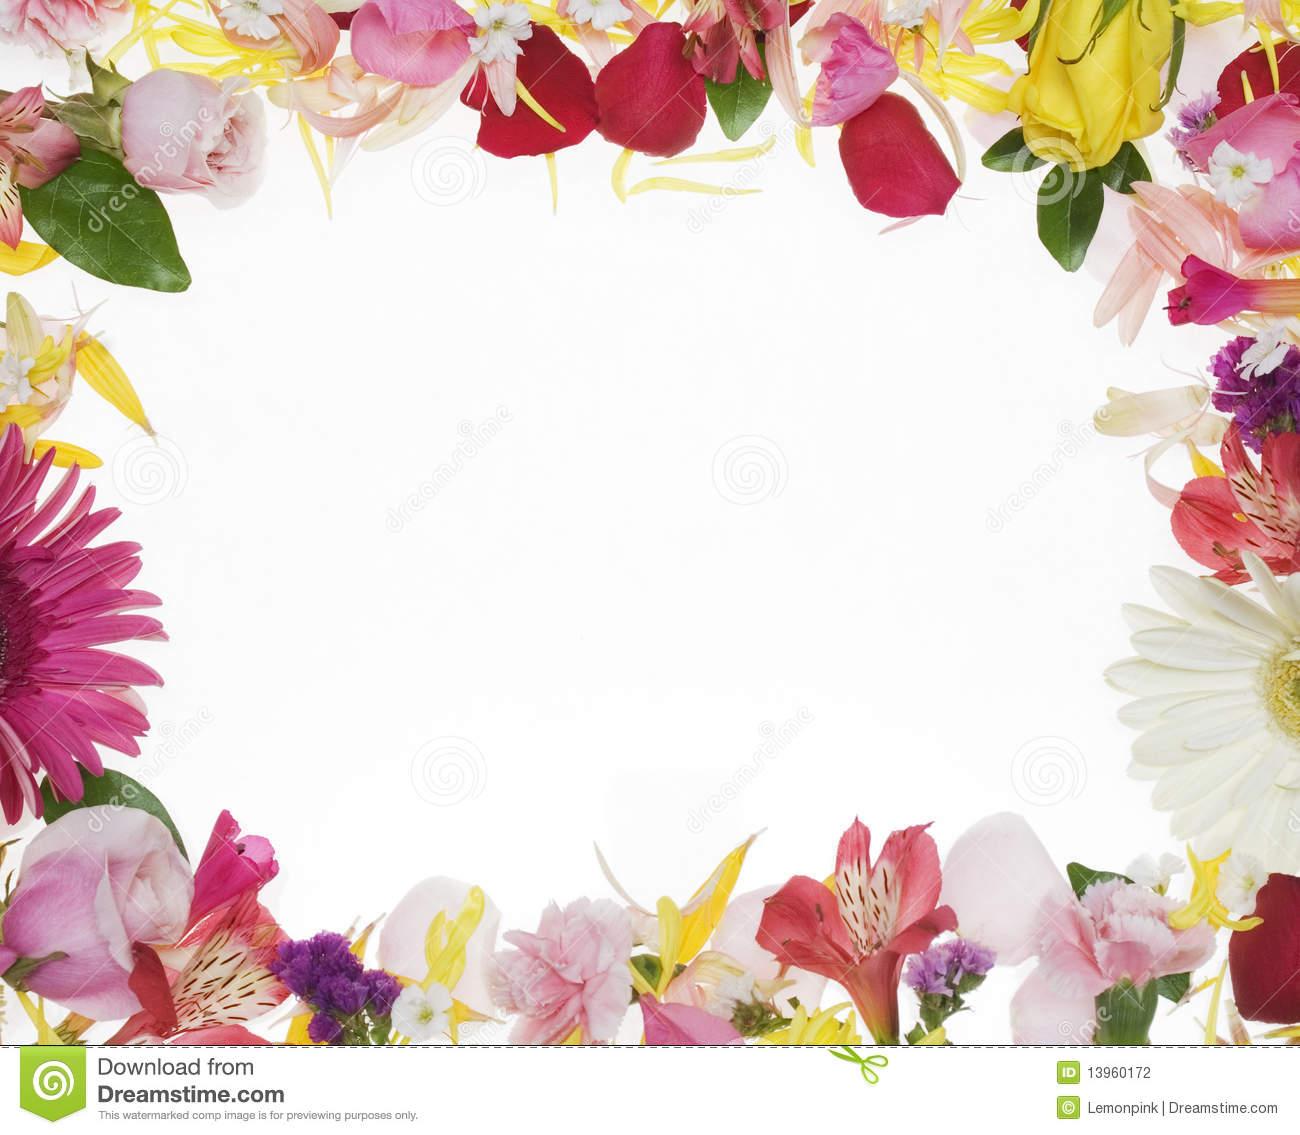 Hd Wallpaper Texture Fall Harvest Flower Boreder Clipground